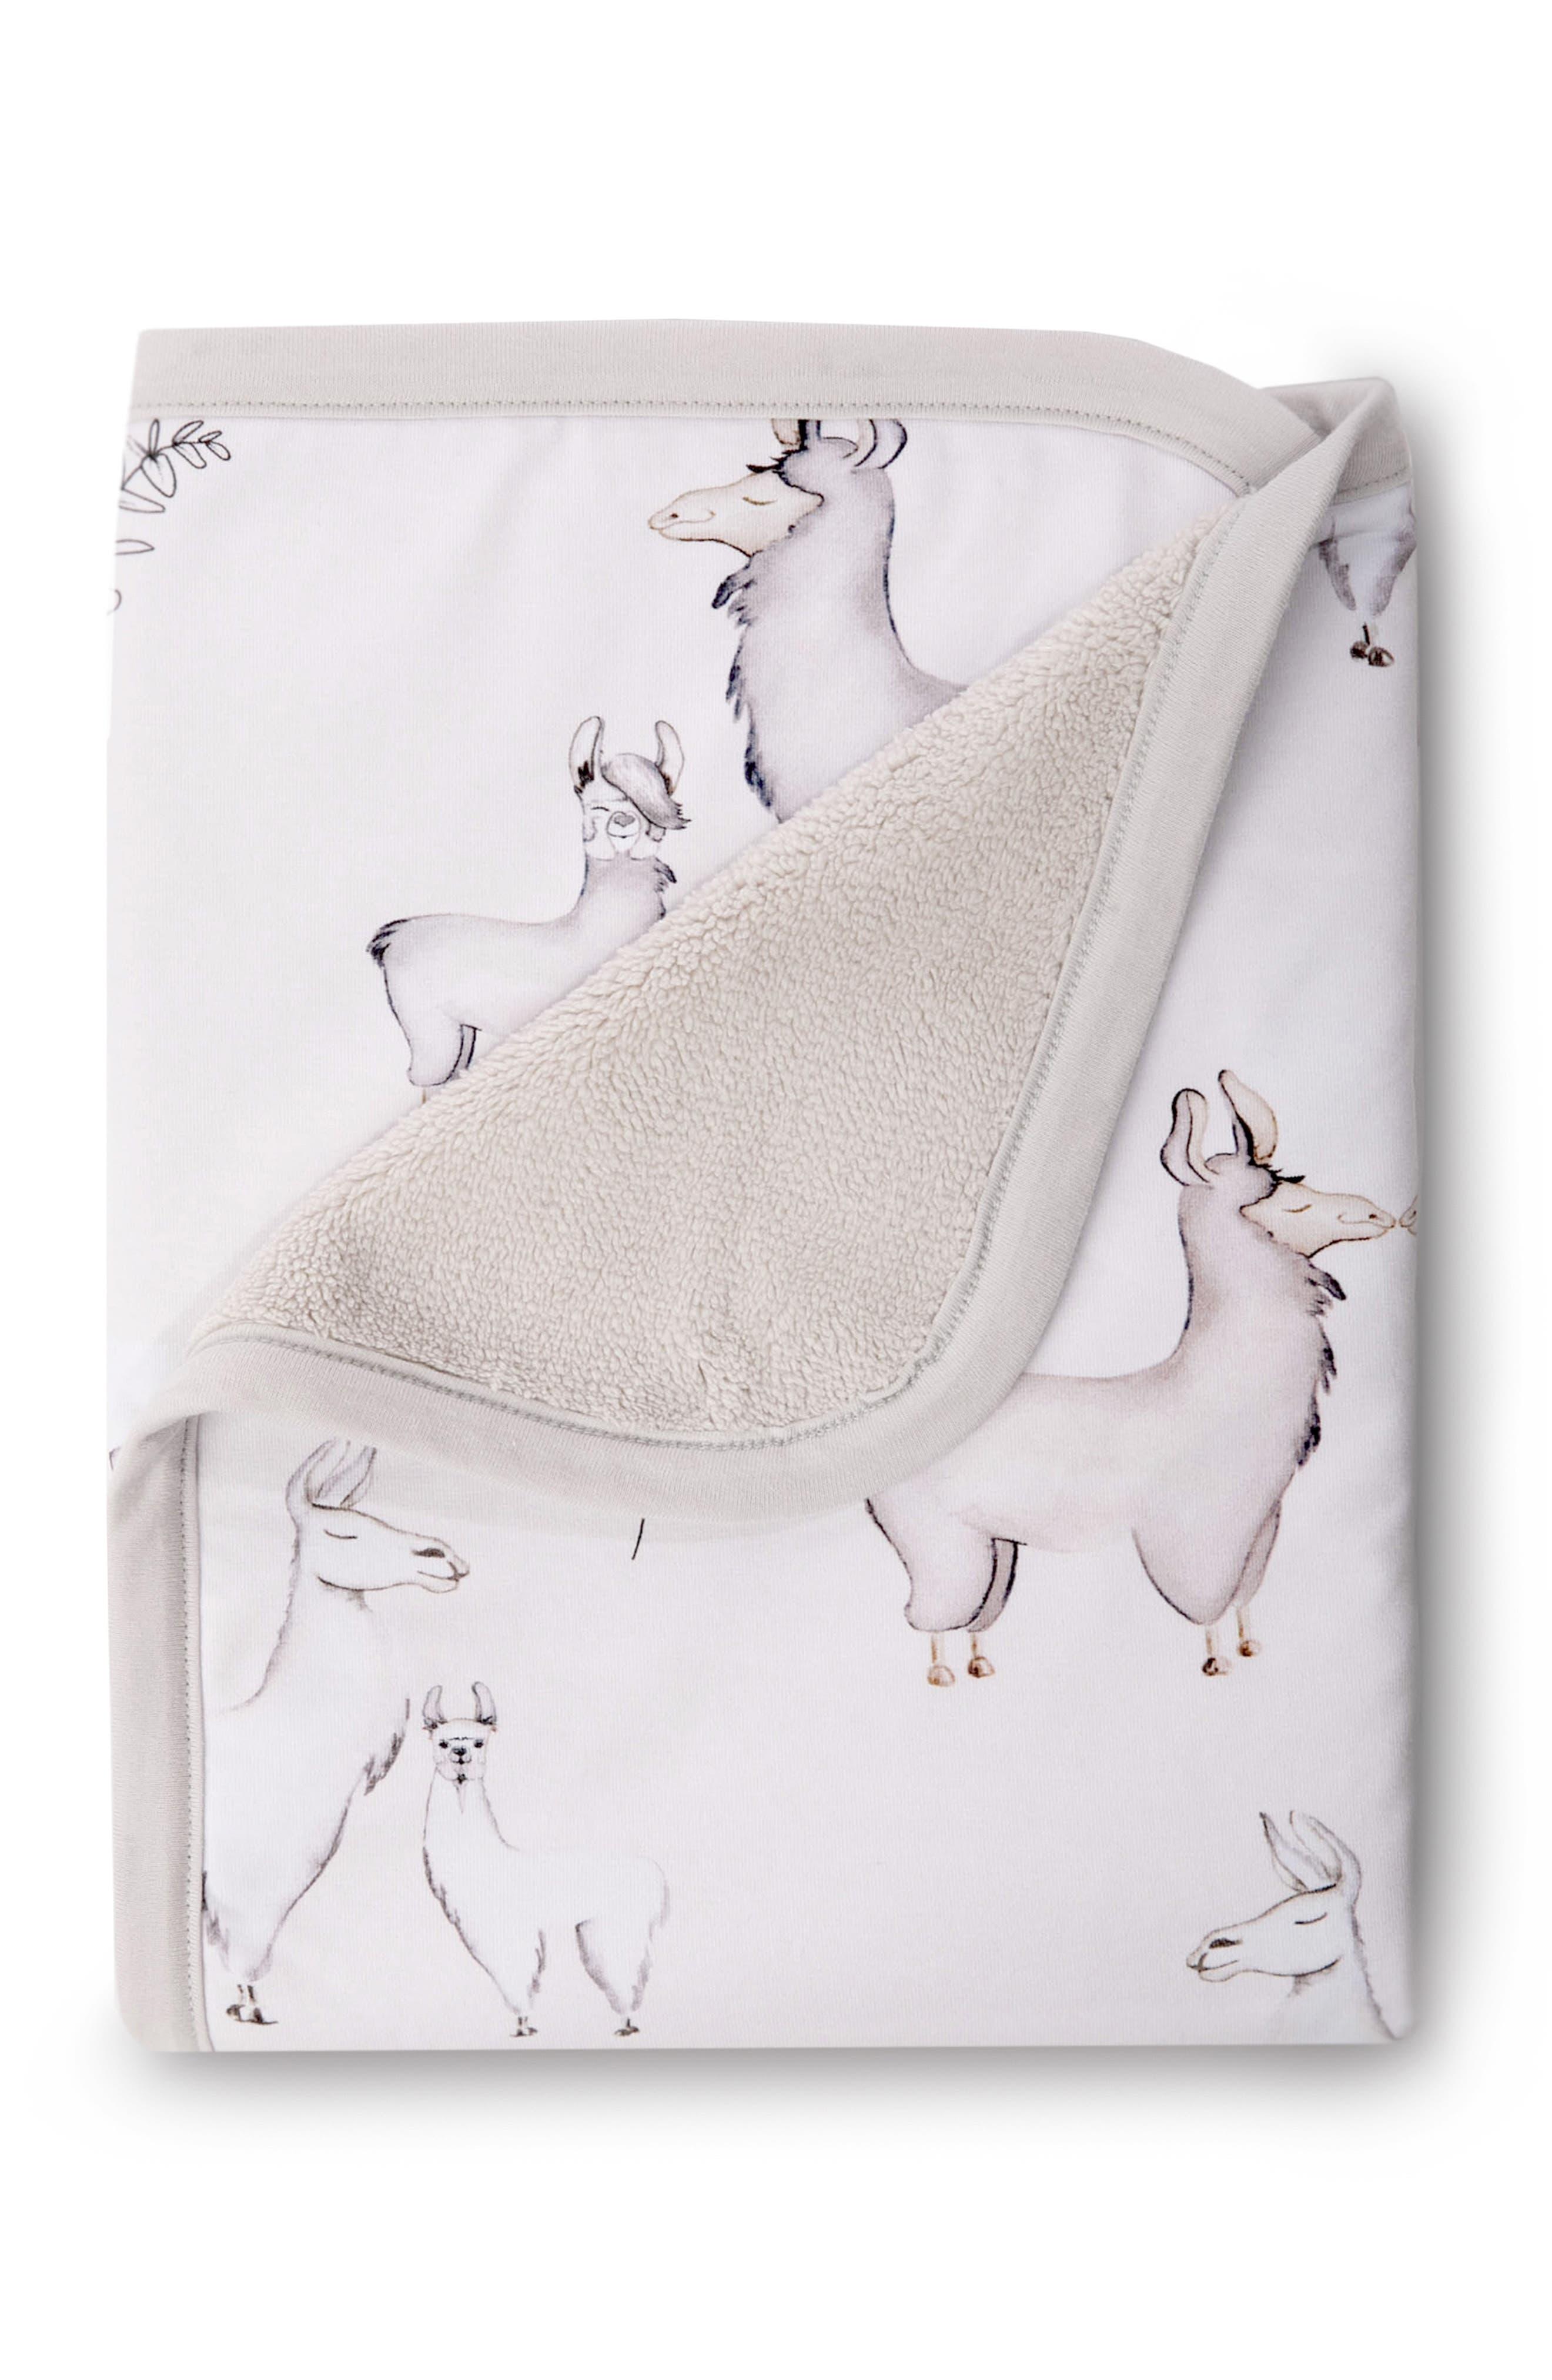 OILO, Llama Jersey Cuddle Blanket, Main thumbnail 1, color, LLAMA